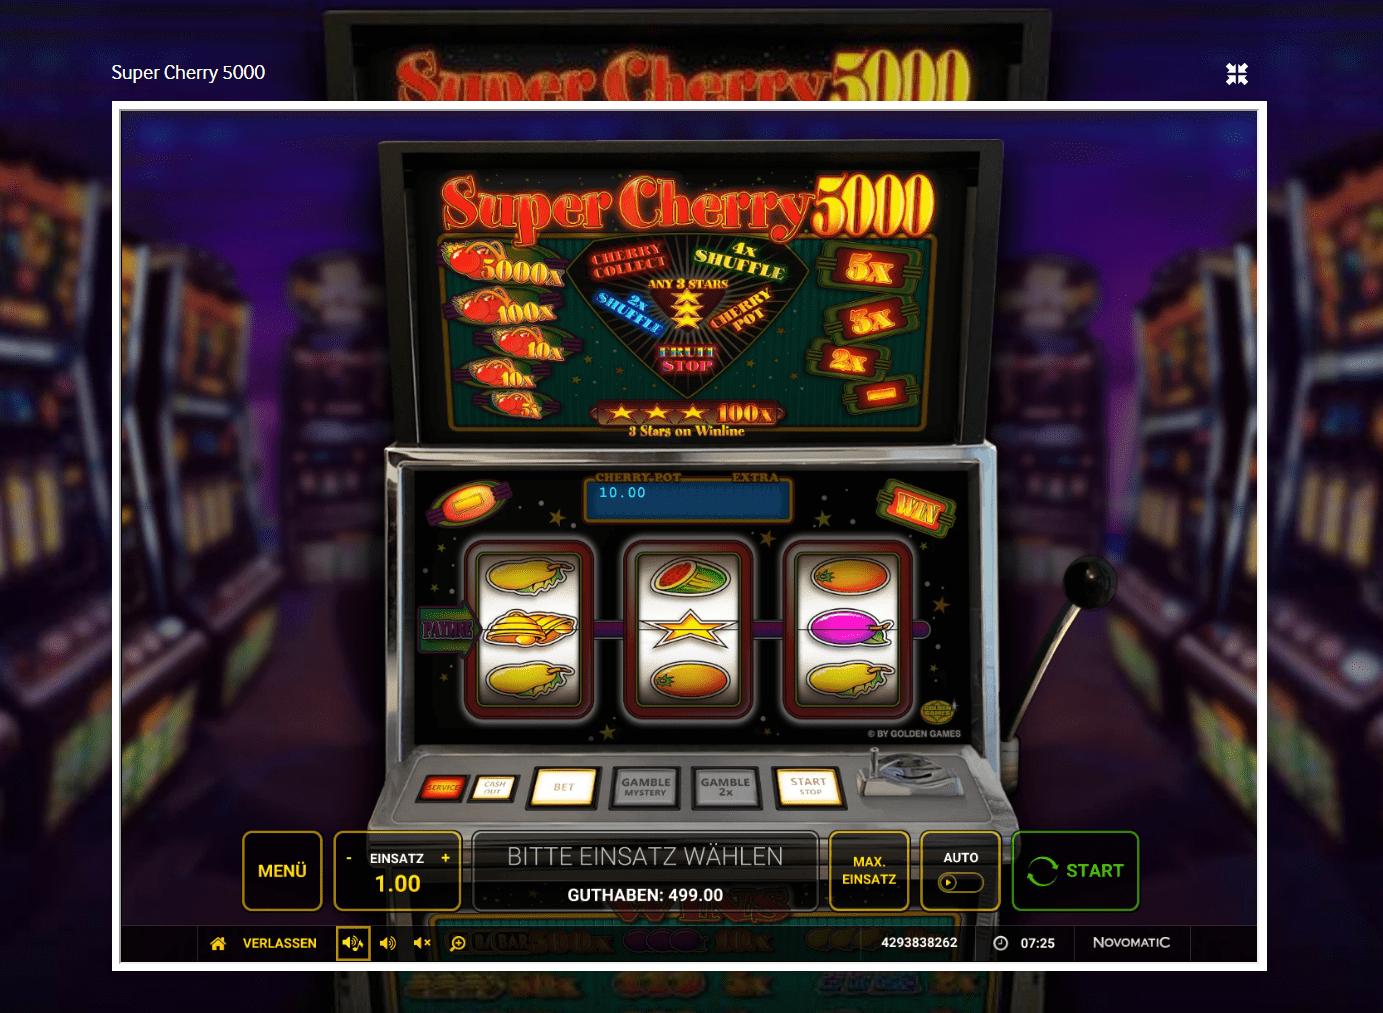 Super Cherry 5000 ch